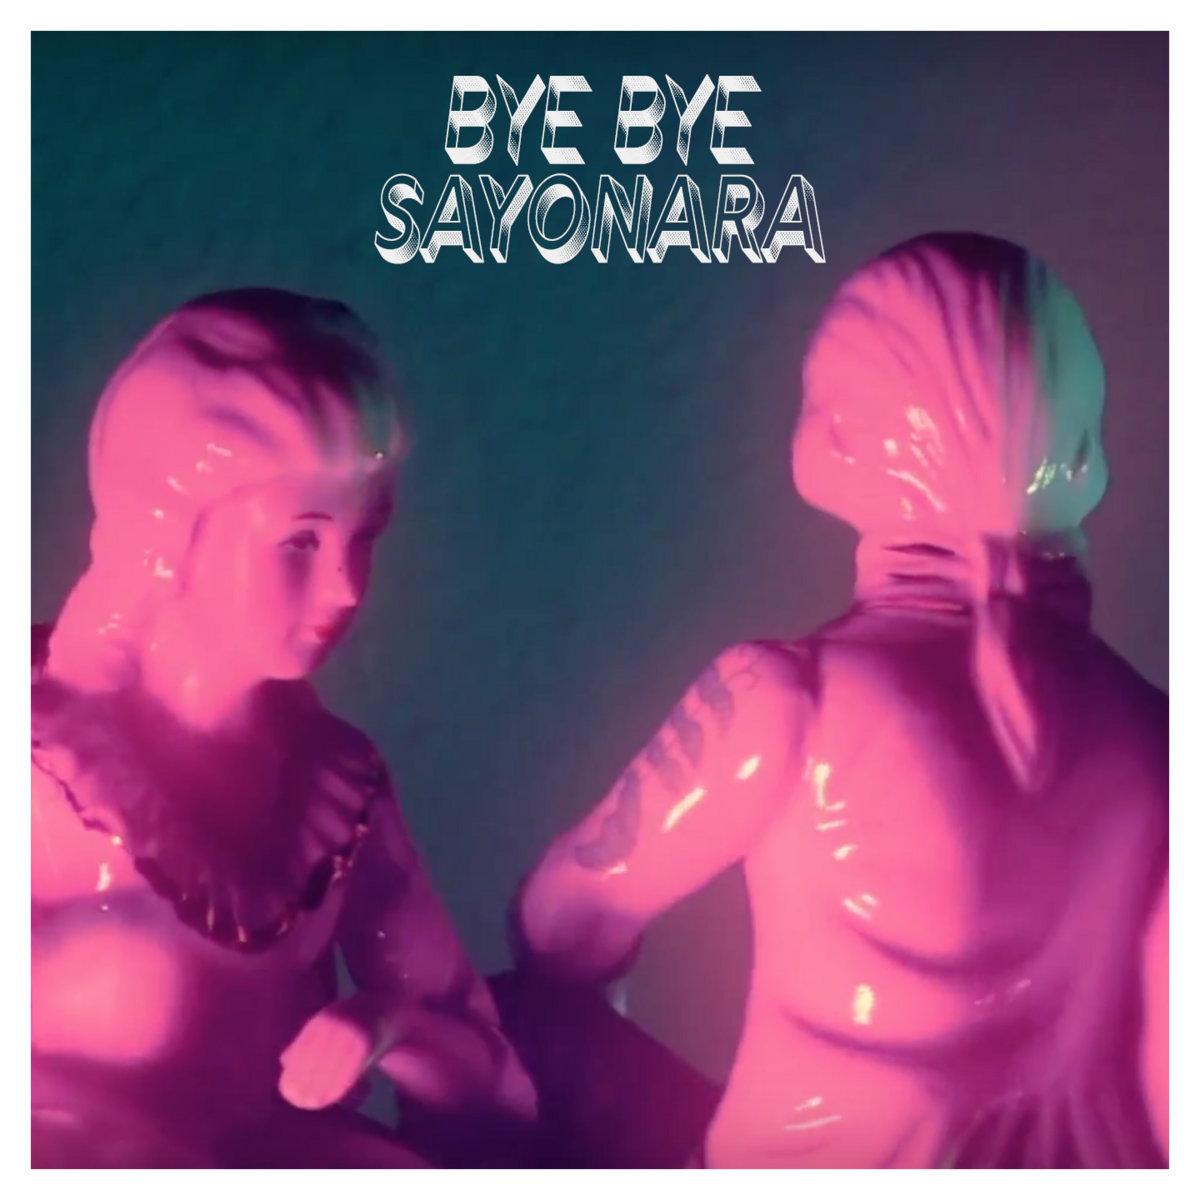 Bye Bye Sayonara (single edit) by Fastlane Candies